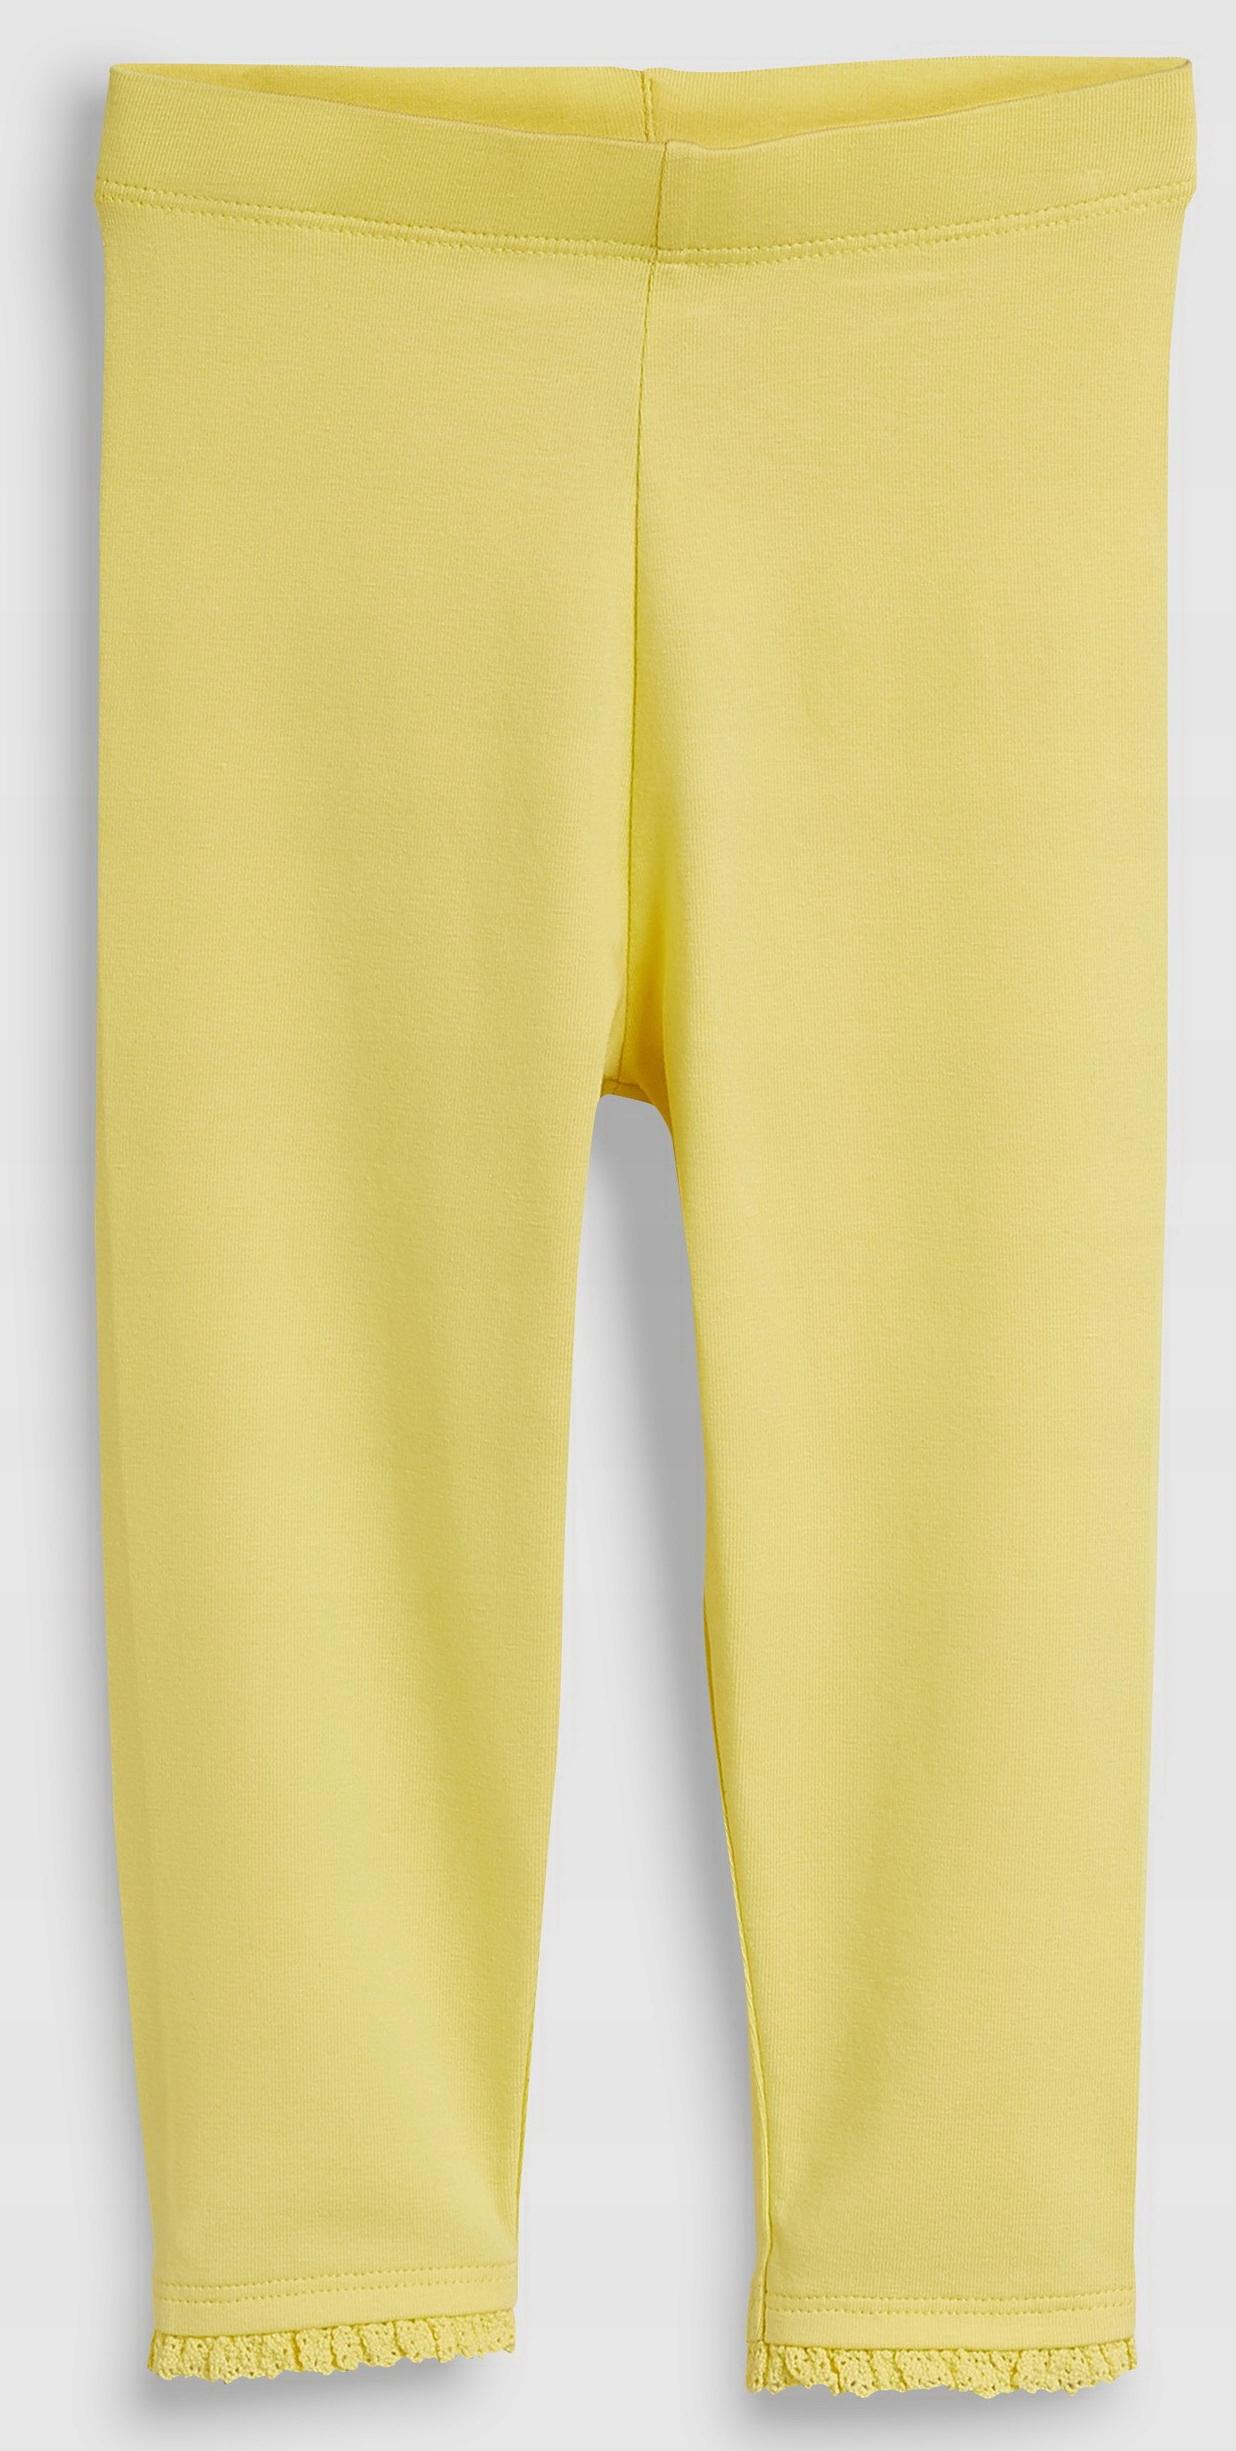 NEXT Legginsy Yellow Frill 3-4 L 2019